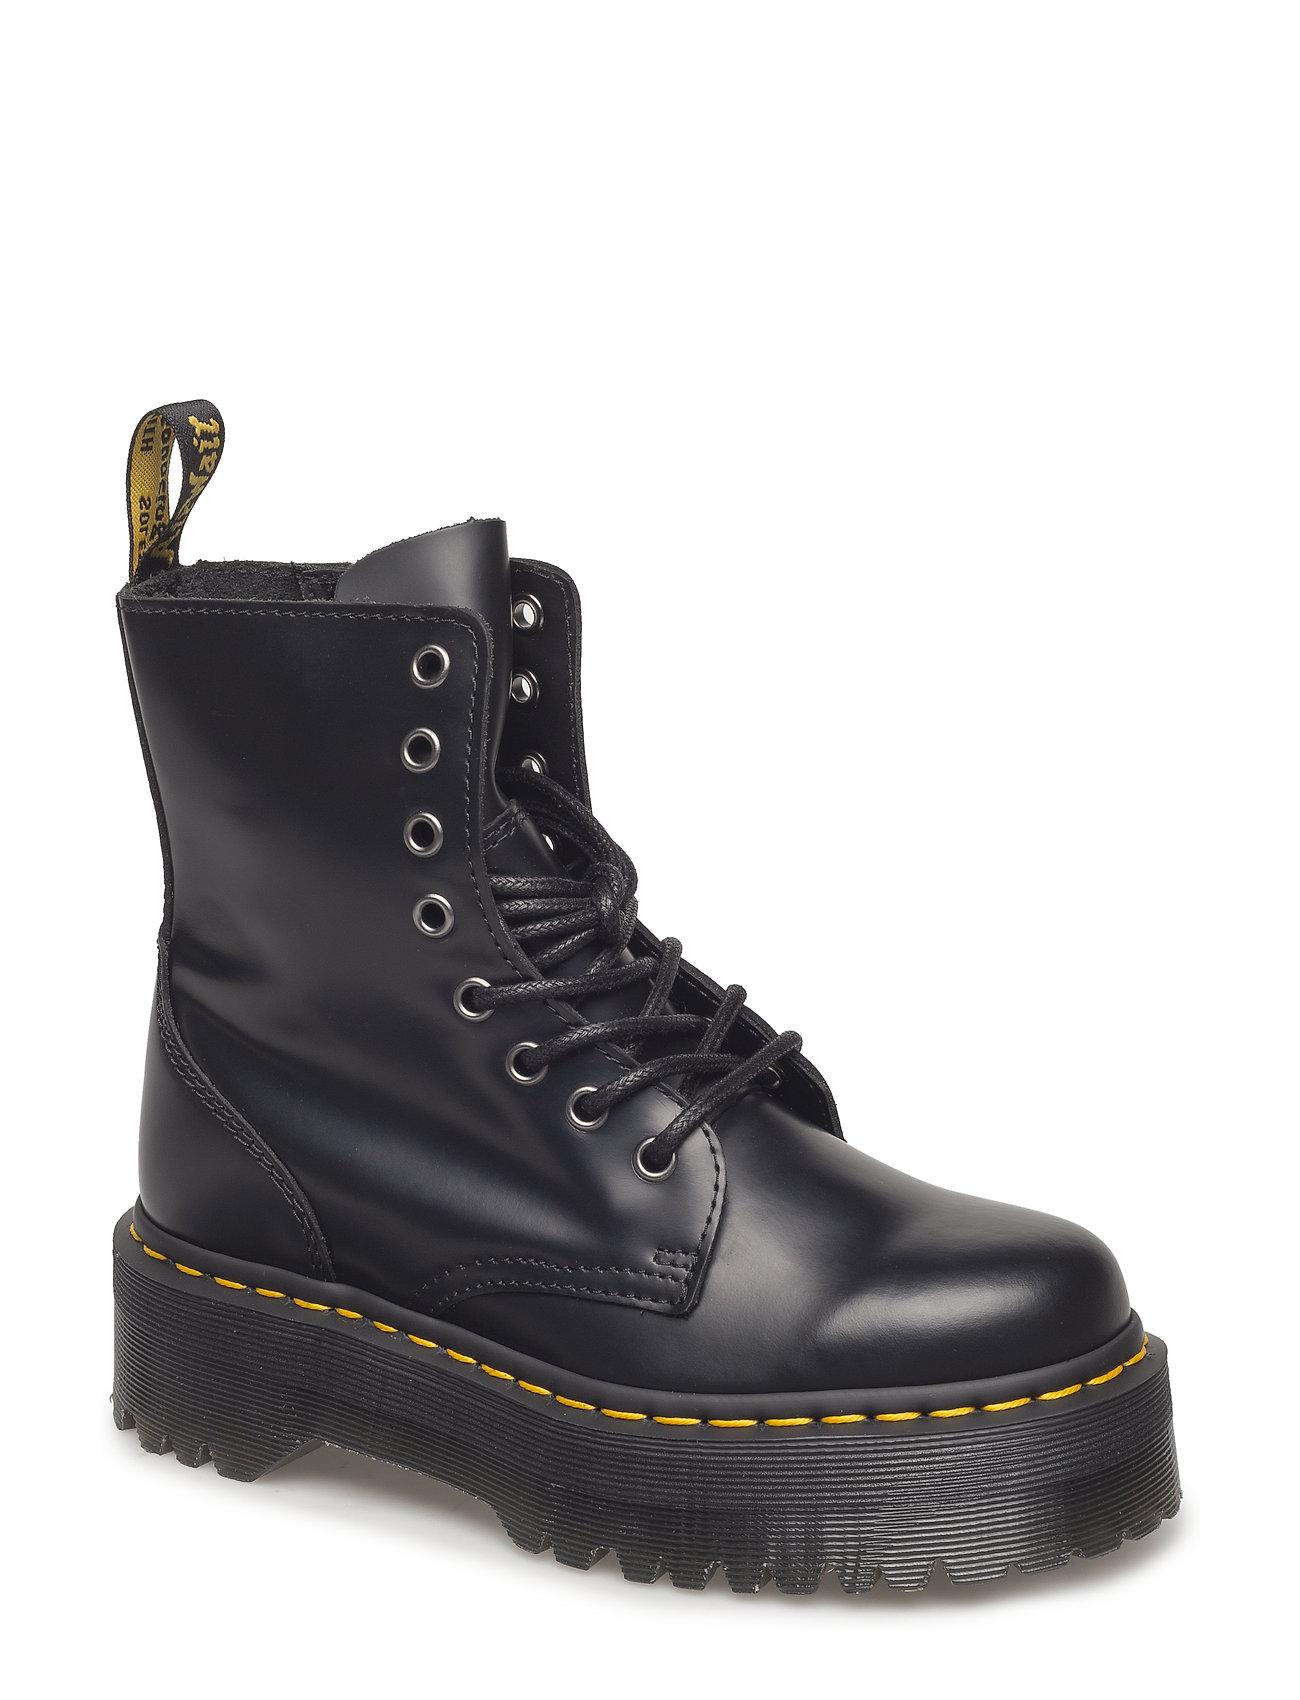 Image of Jadon Black Polished Smooth Shoes Boots Ankle Boots Ankle Boot - Flat Sort Dr. Martens (3457461665)